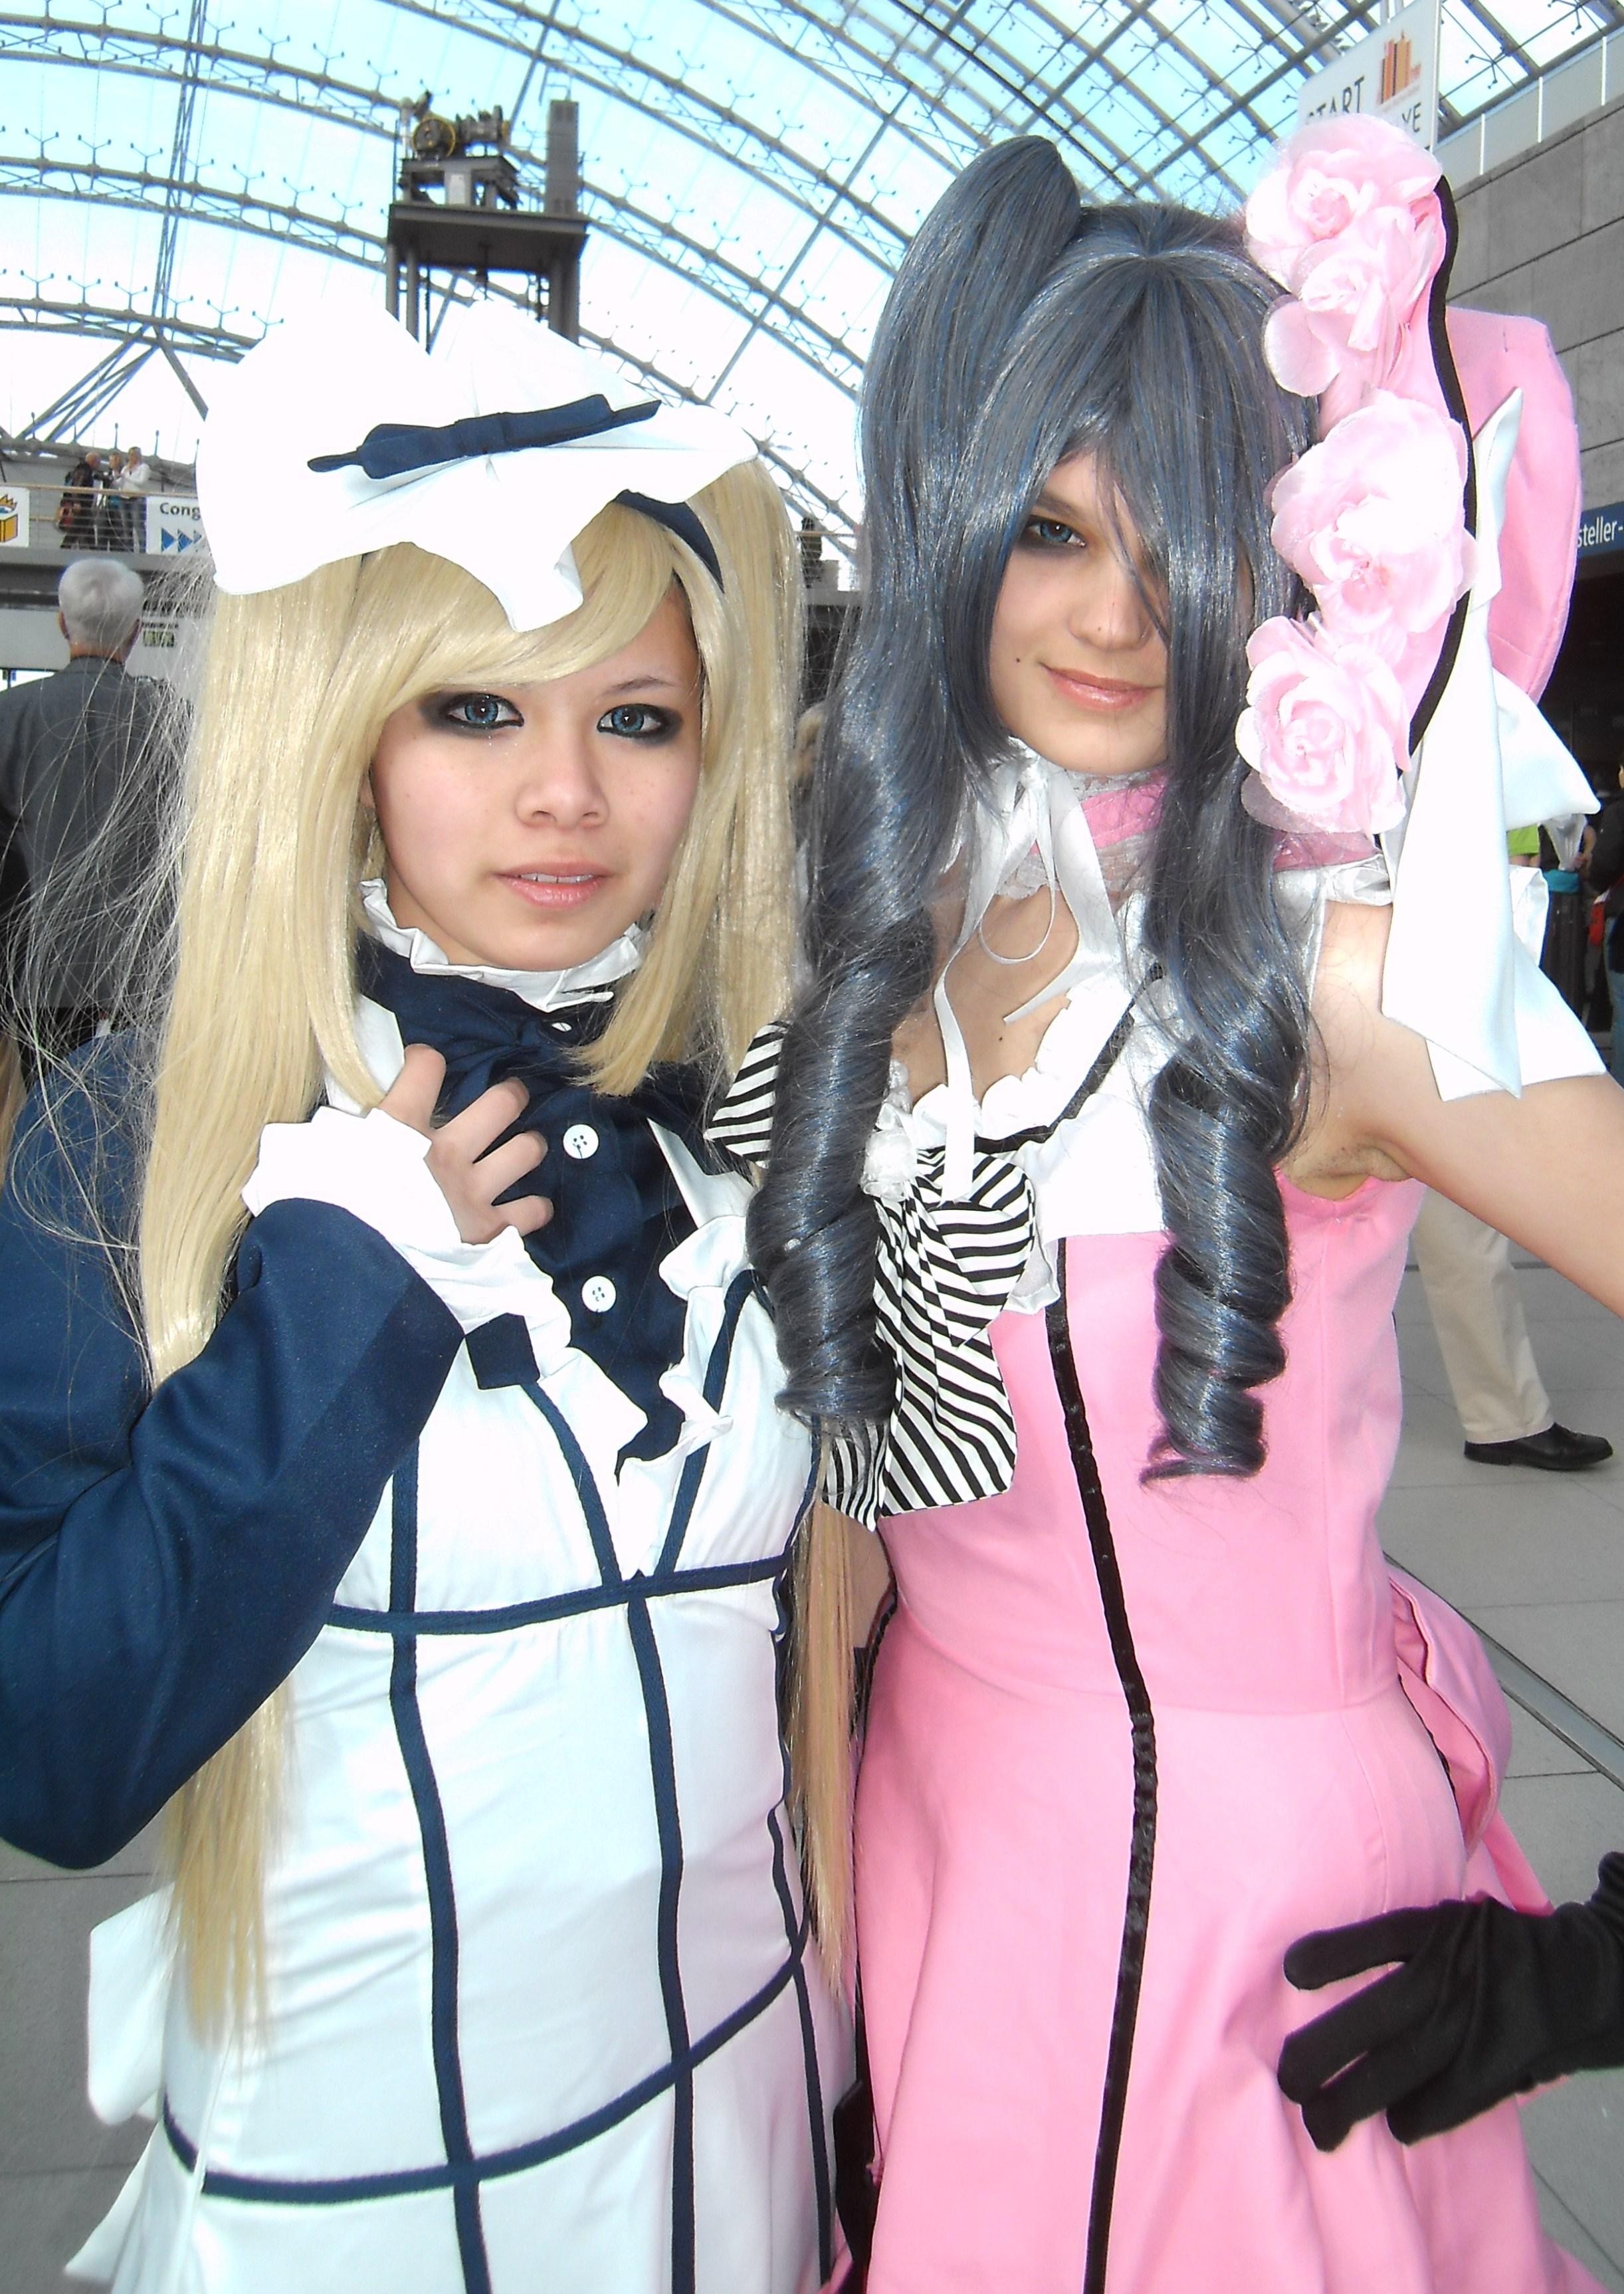 cosplay图片 黄山cosplay图片 milla maxwell cosplay740图片高清图片